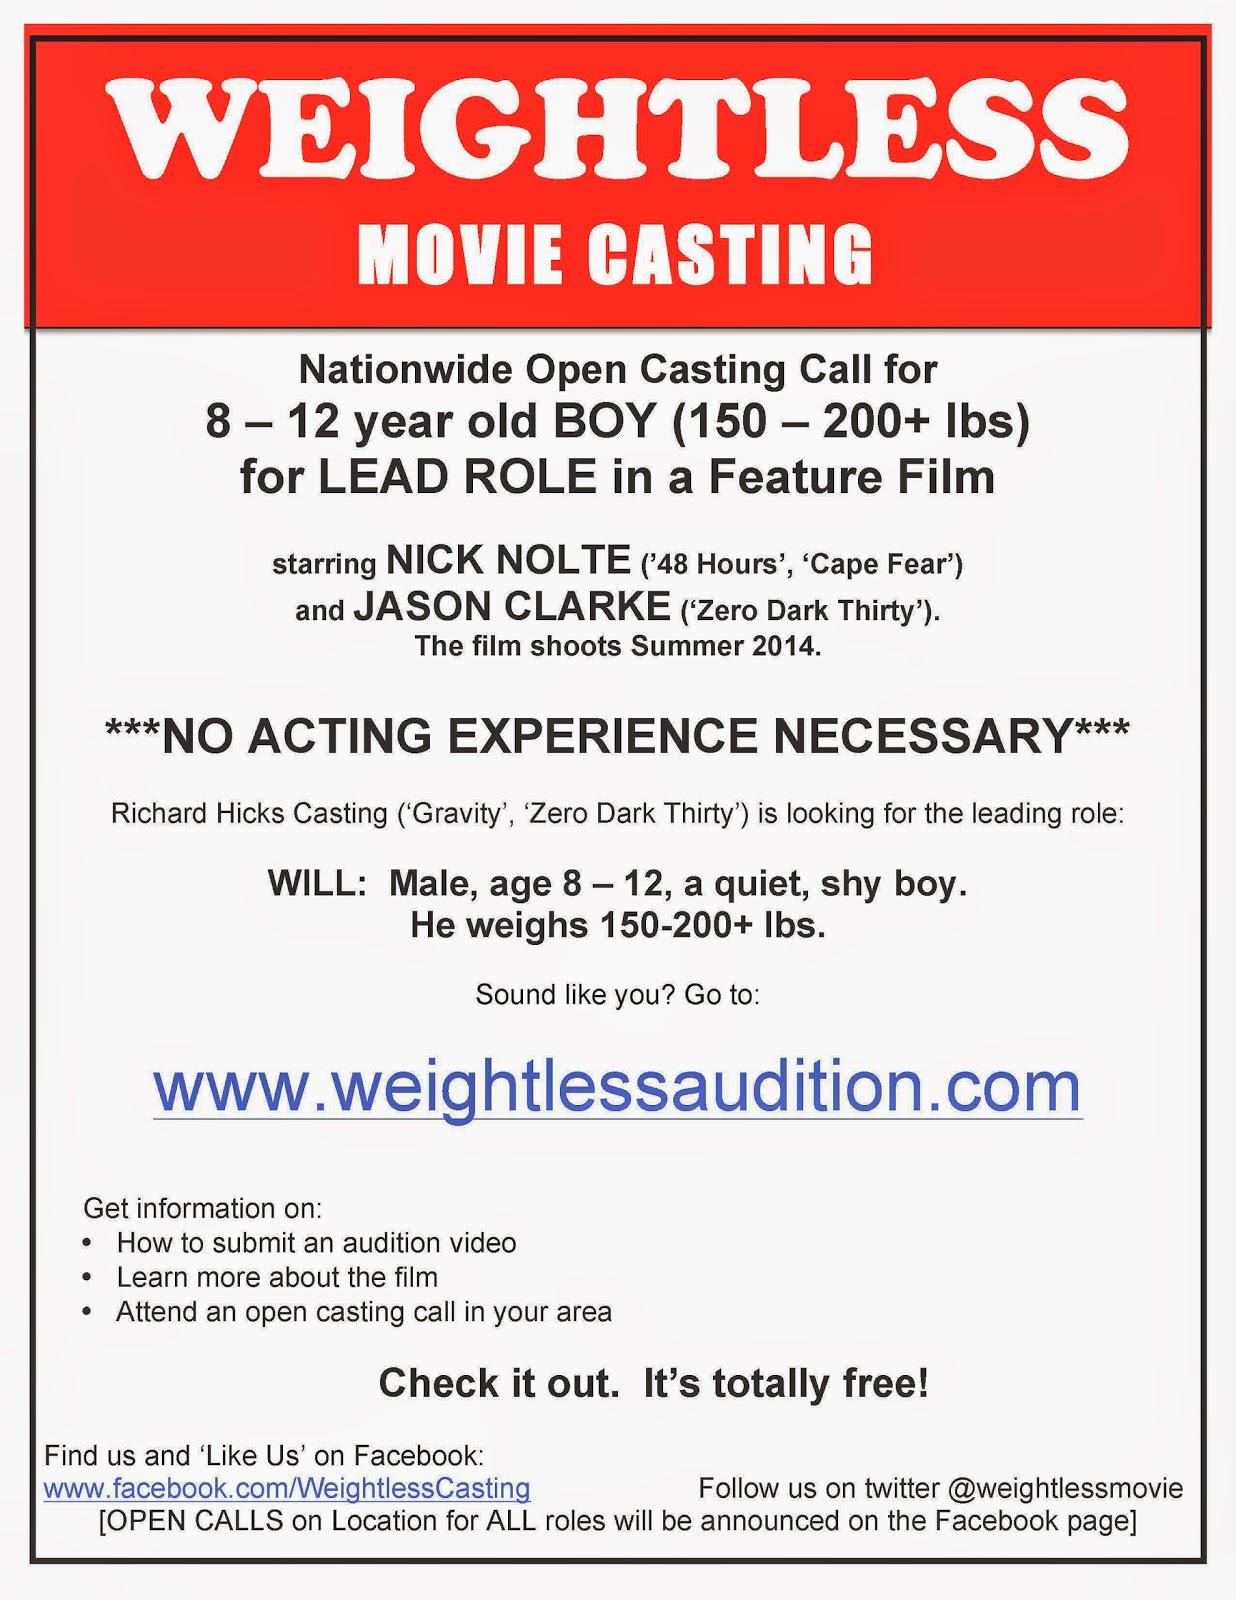 Weightless movie casting kurt kelly news weightless movie casting fandeluxe Choice Image